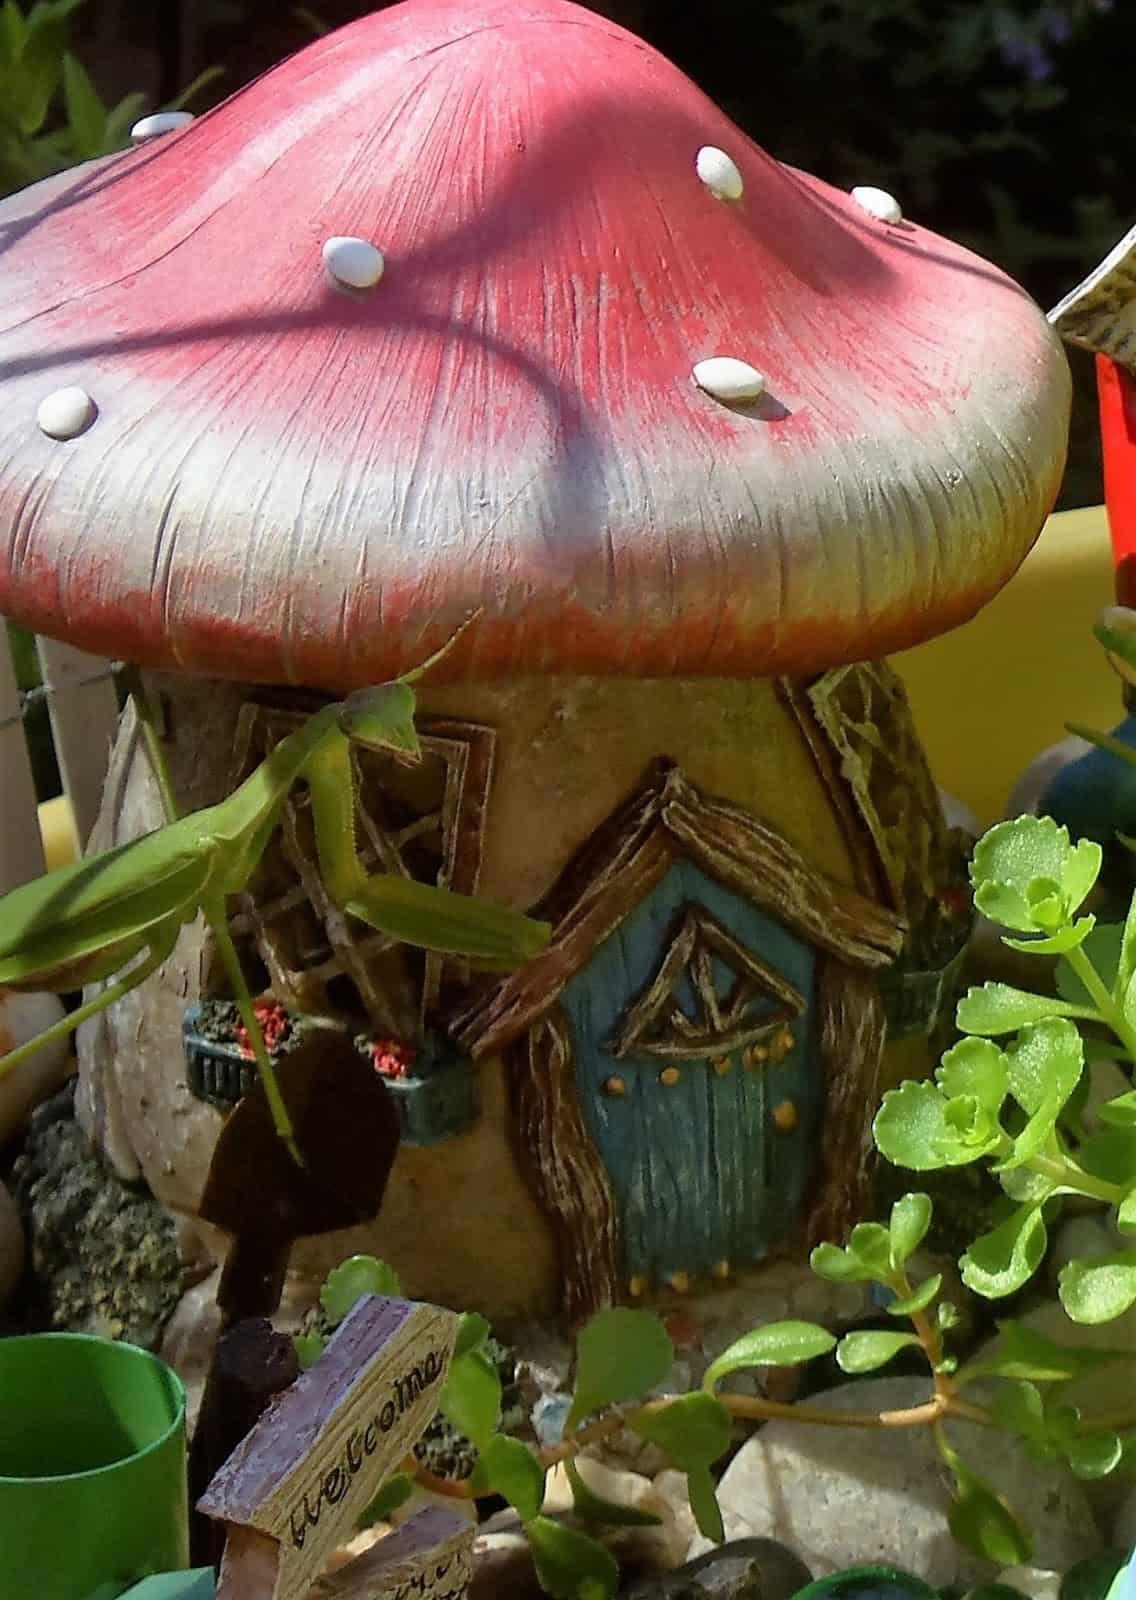 debbie-dabble-photo-of-praying-mantis-and-mushroom